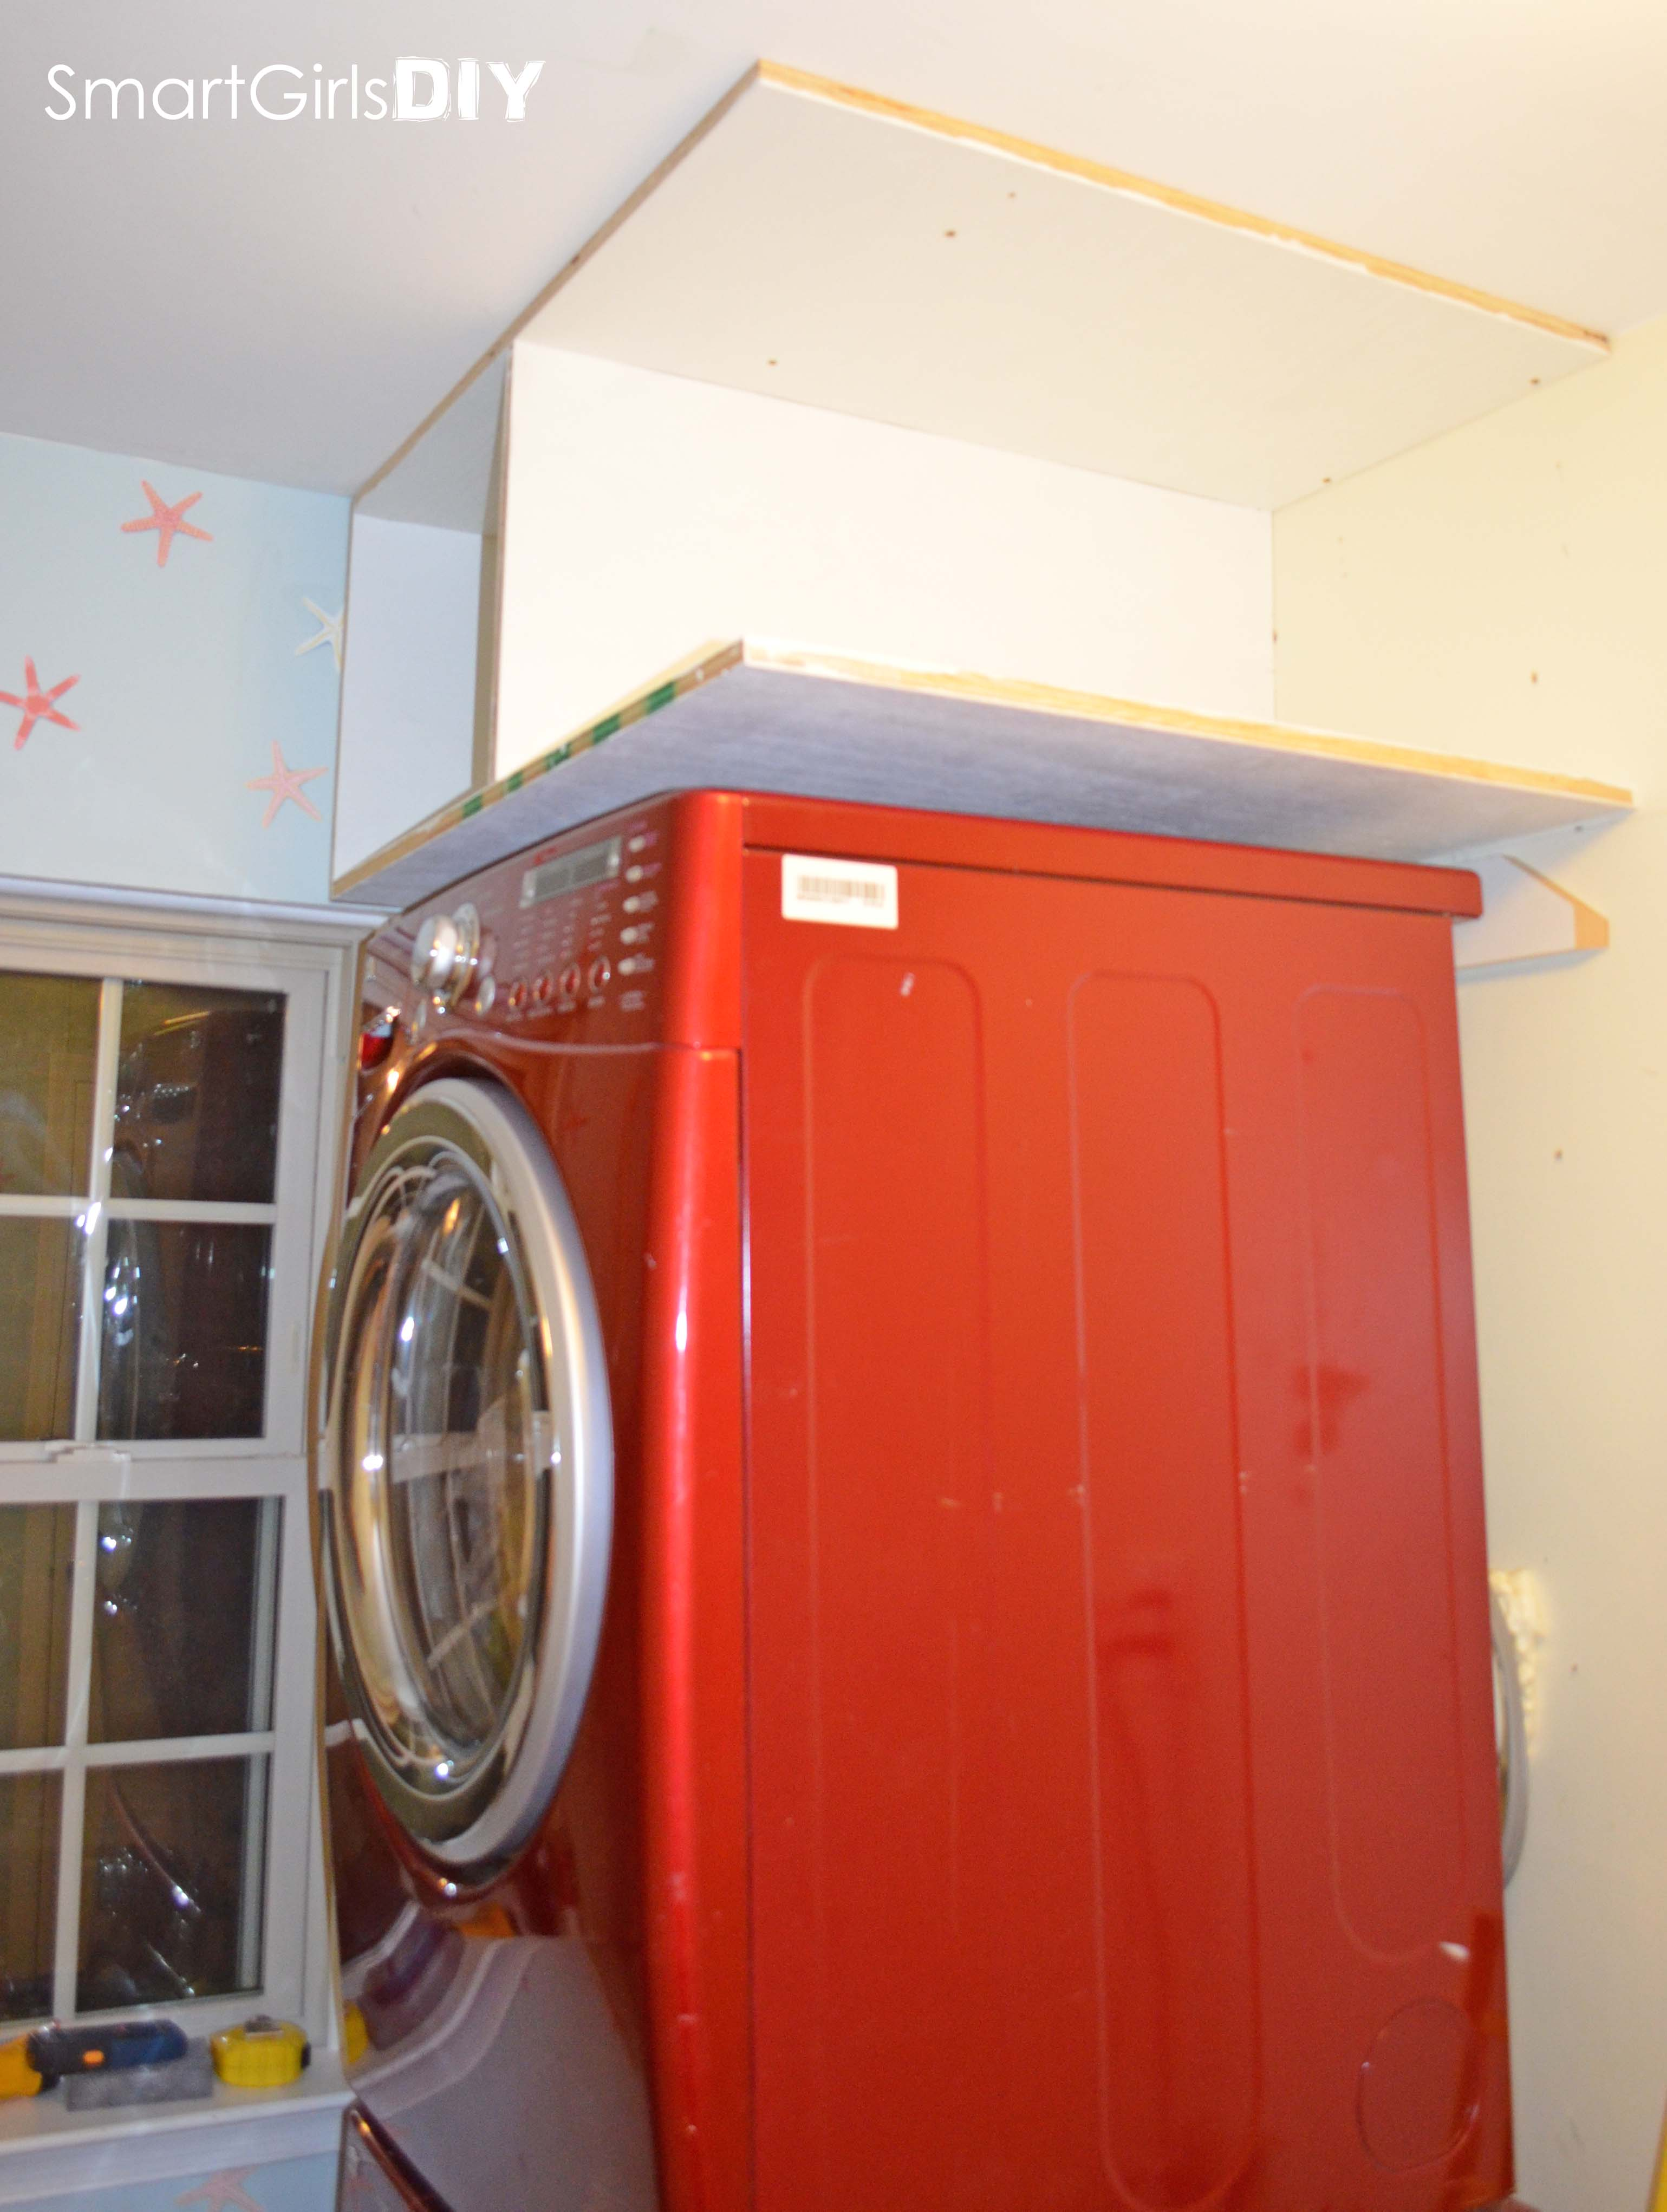 smart girls diy blog building custom shelf over stacked washer dryer how to